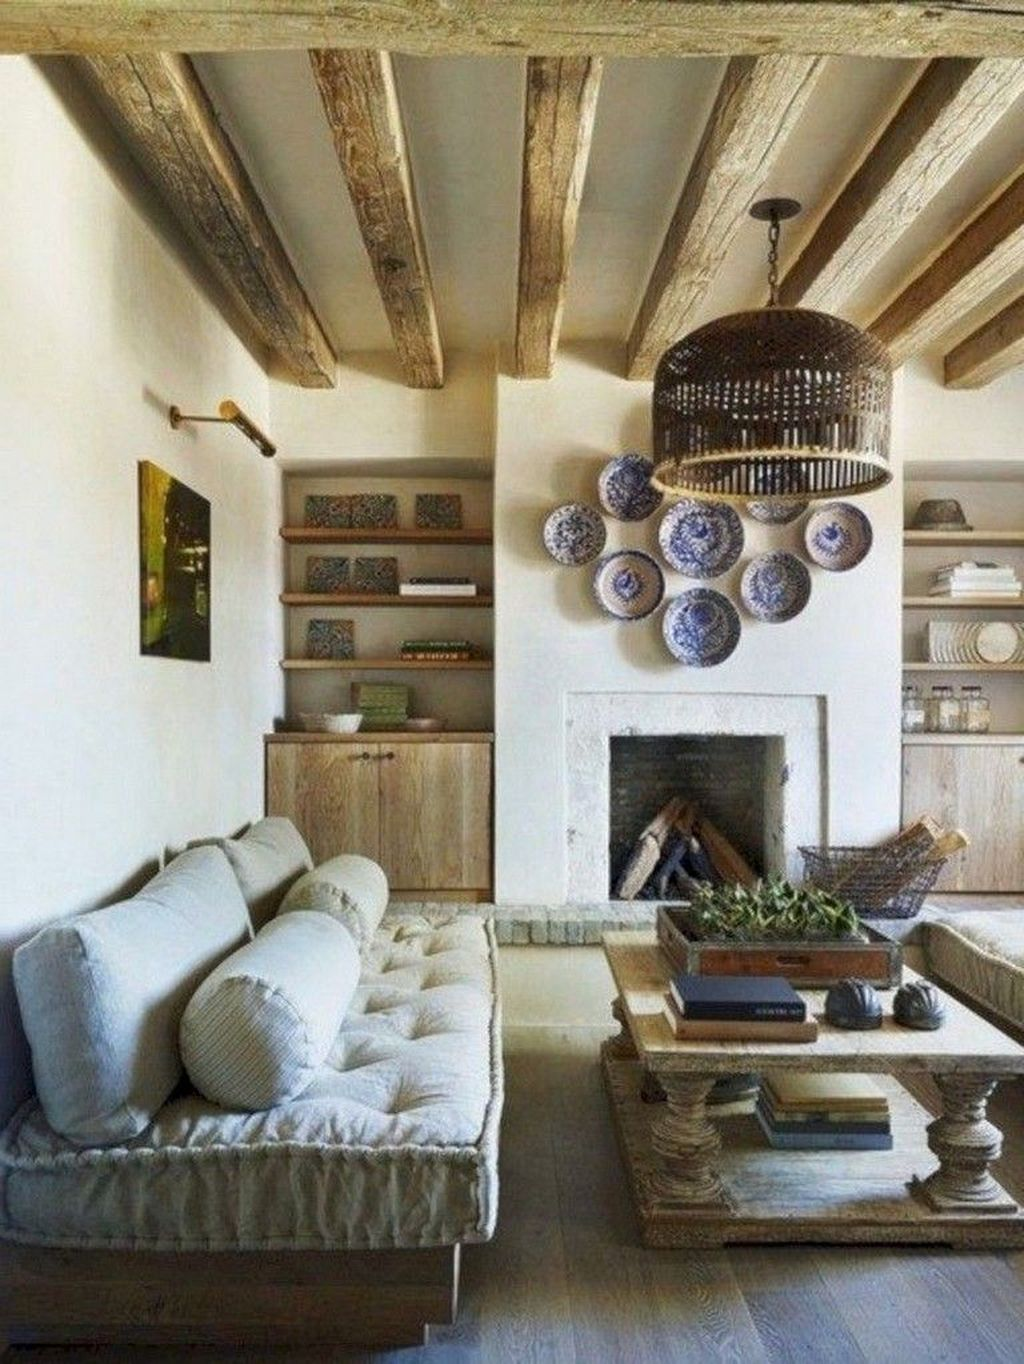 Fabulous Rustic Italian Decor Ideas For Your Home 05